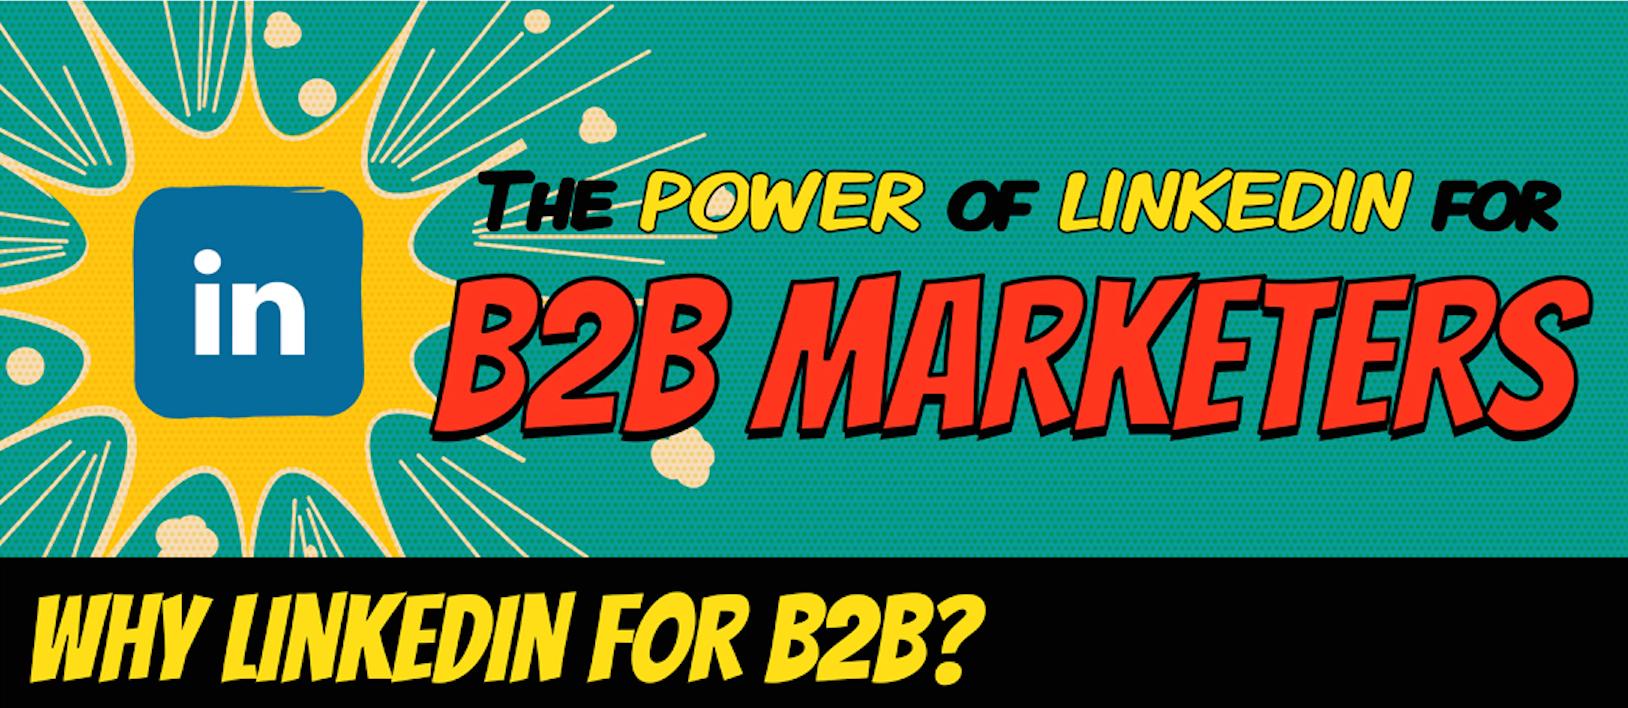 LinkedIn-for-B2B